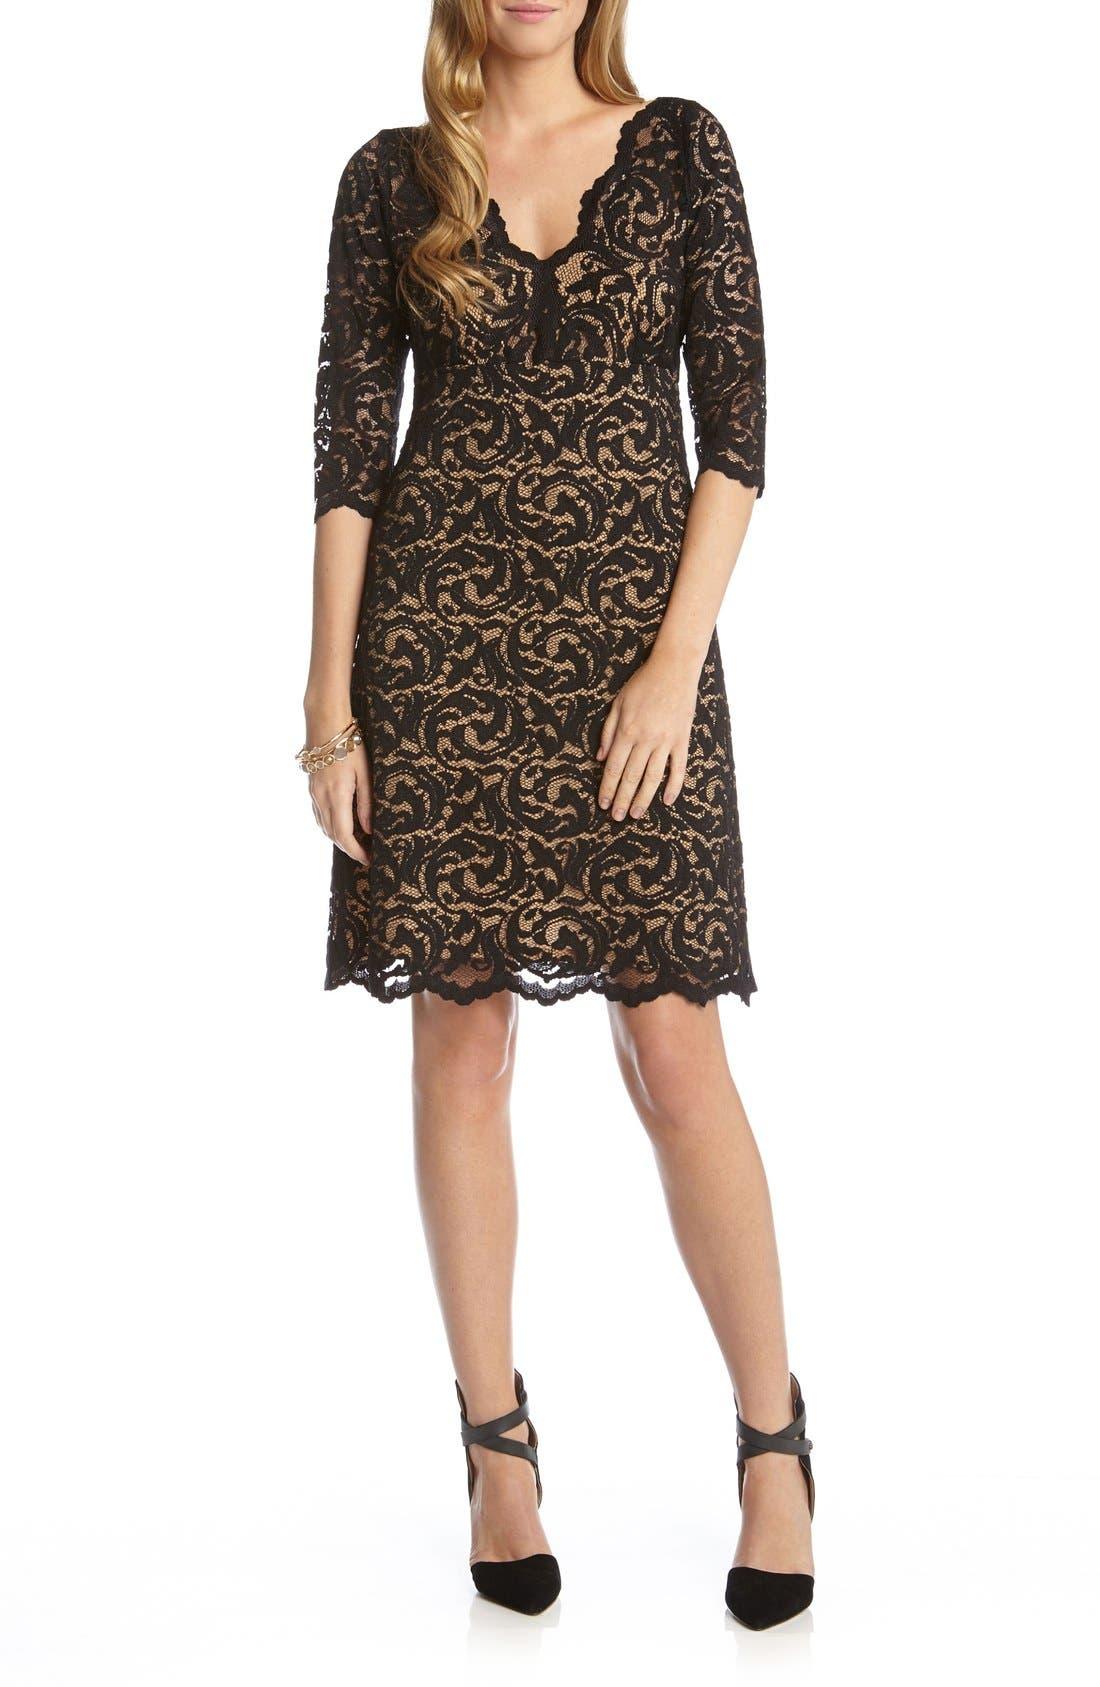 Scalloped Lace V-Neck Dress,                             Main thumbnail 1, color,                             Black/ Nude